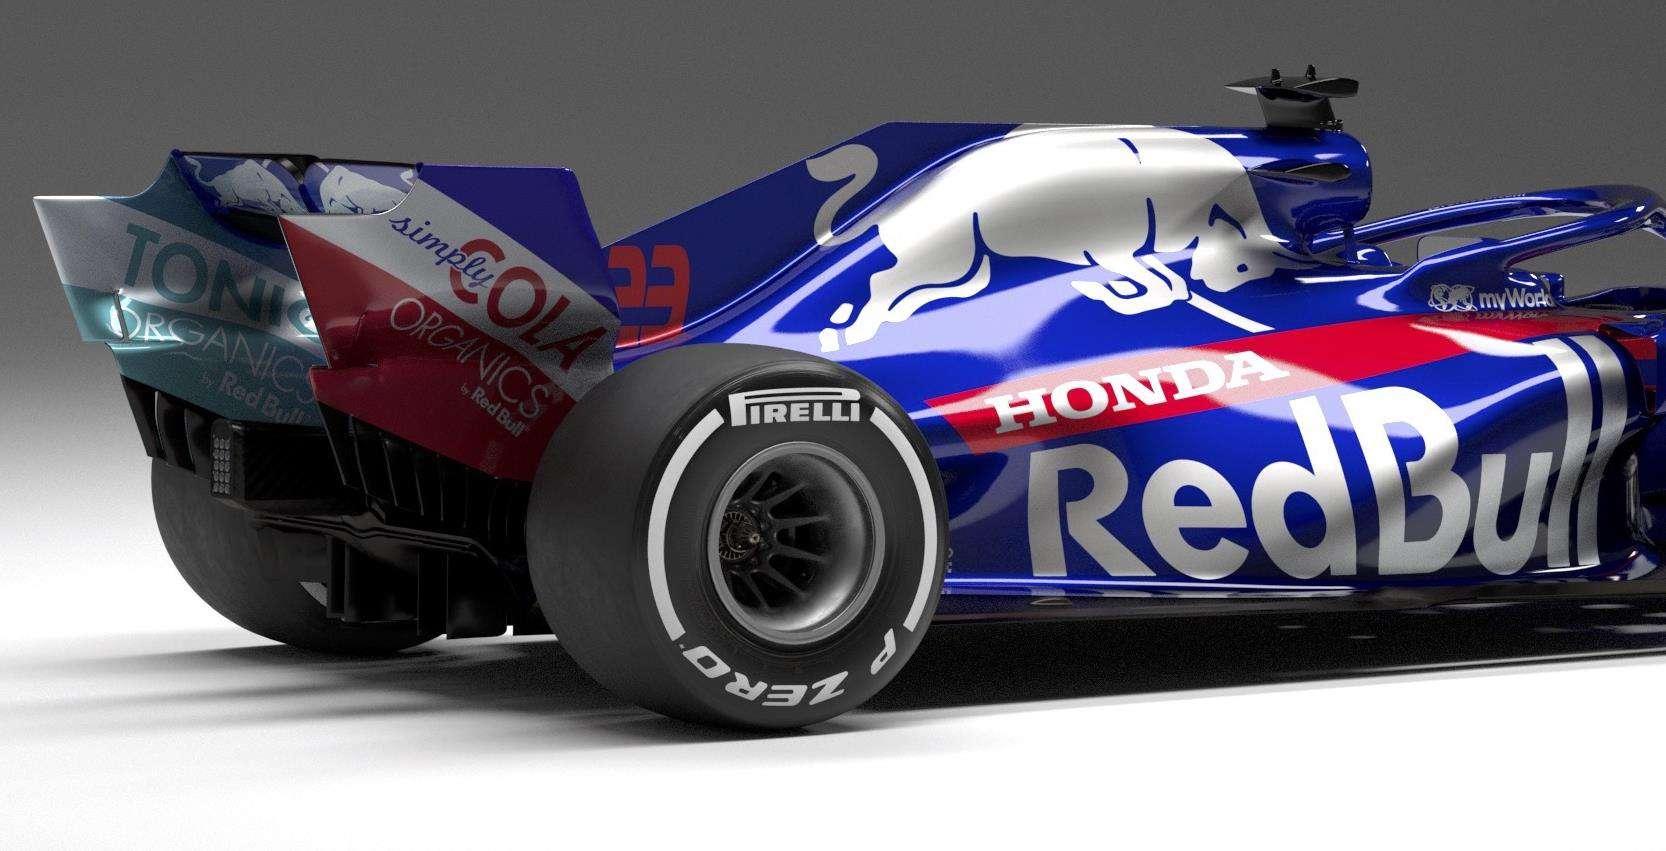 2019-Toro-Rosso-STR14-Honda-MAXF1net-F1tech-engine-cover-rear-wing